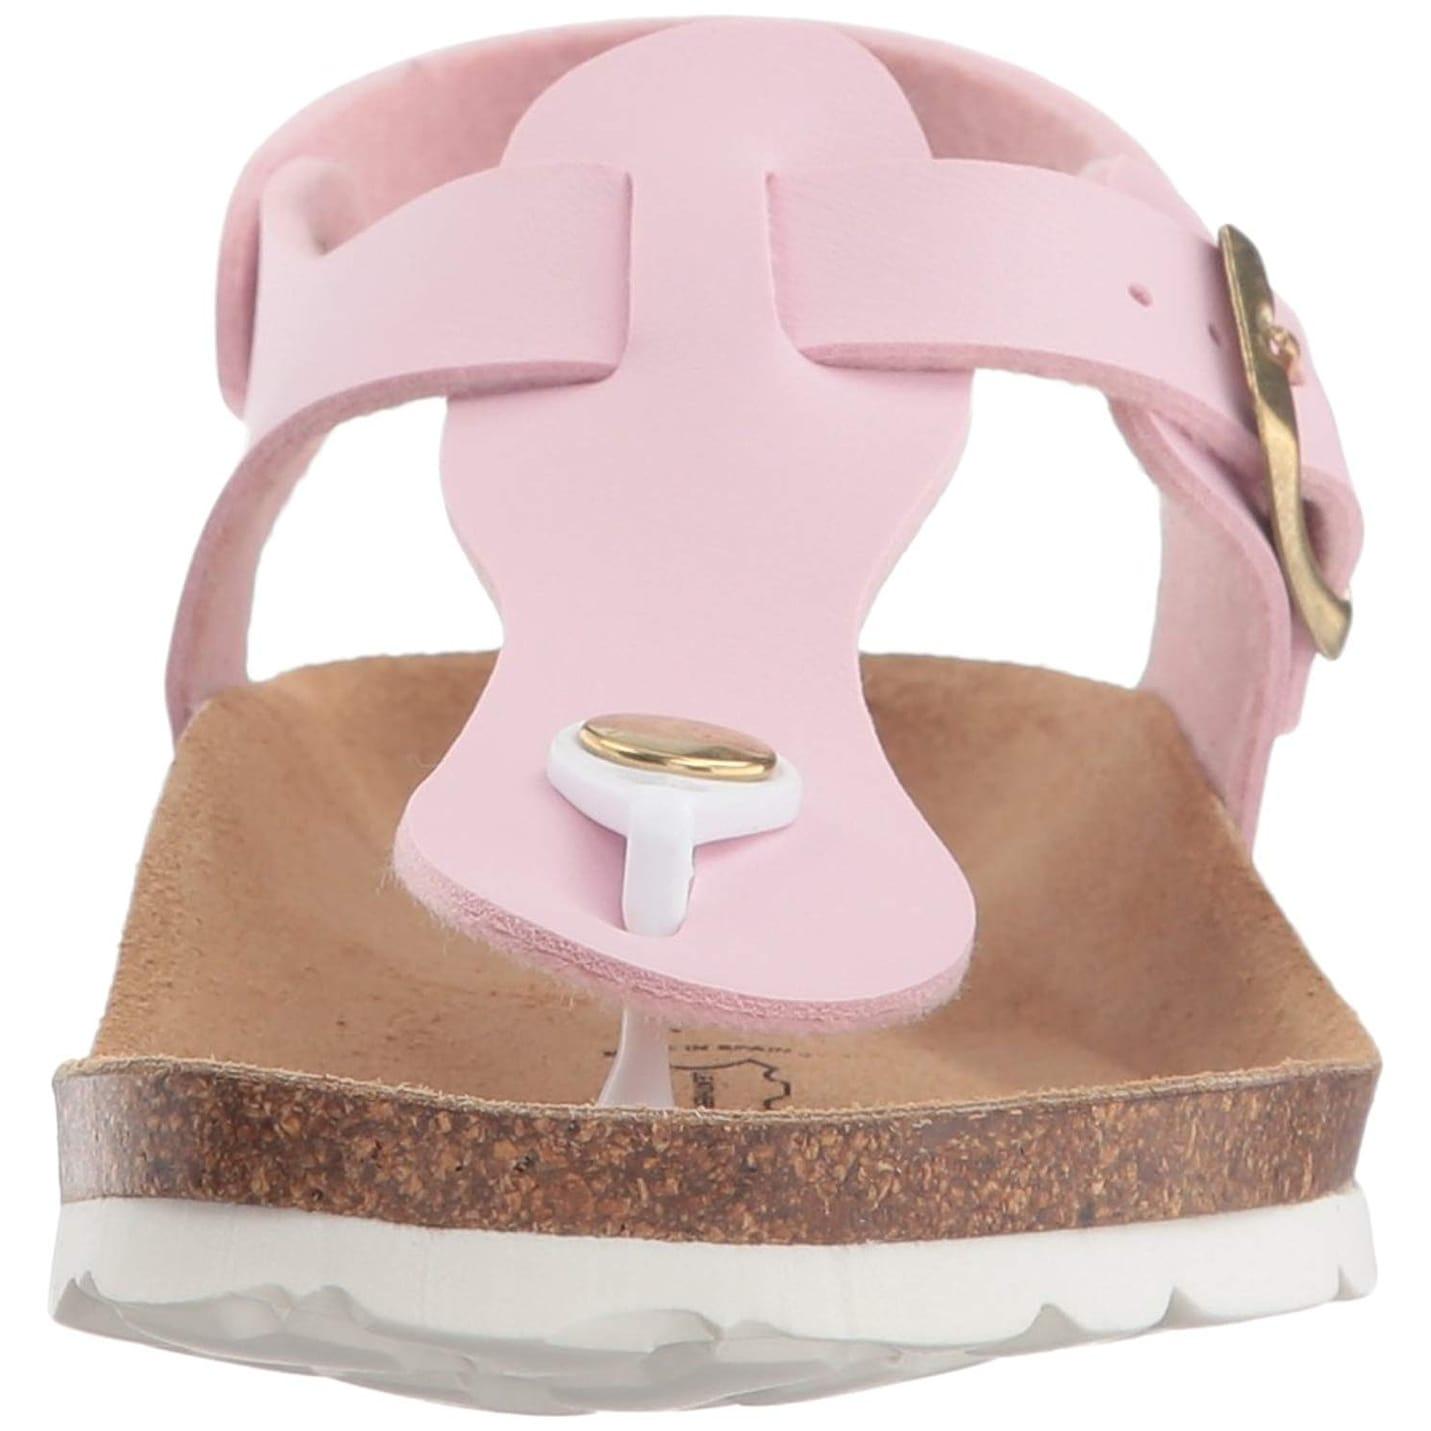 20890b3cb04 Shop Kids Bayton Girls Rhea Buckle SlingBack Platform Sandals - Free  Shipping On Orders Over  45 - Overstock - 23126481